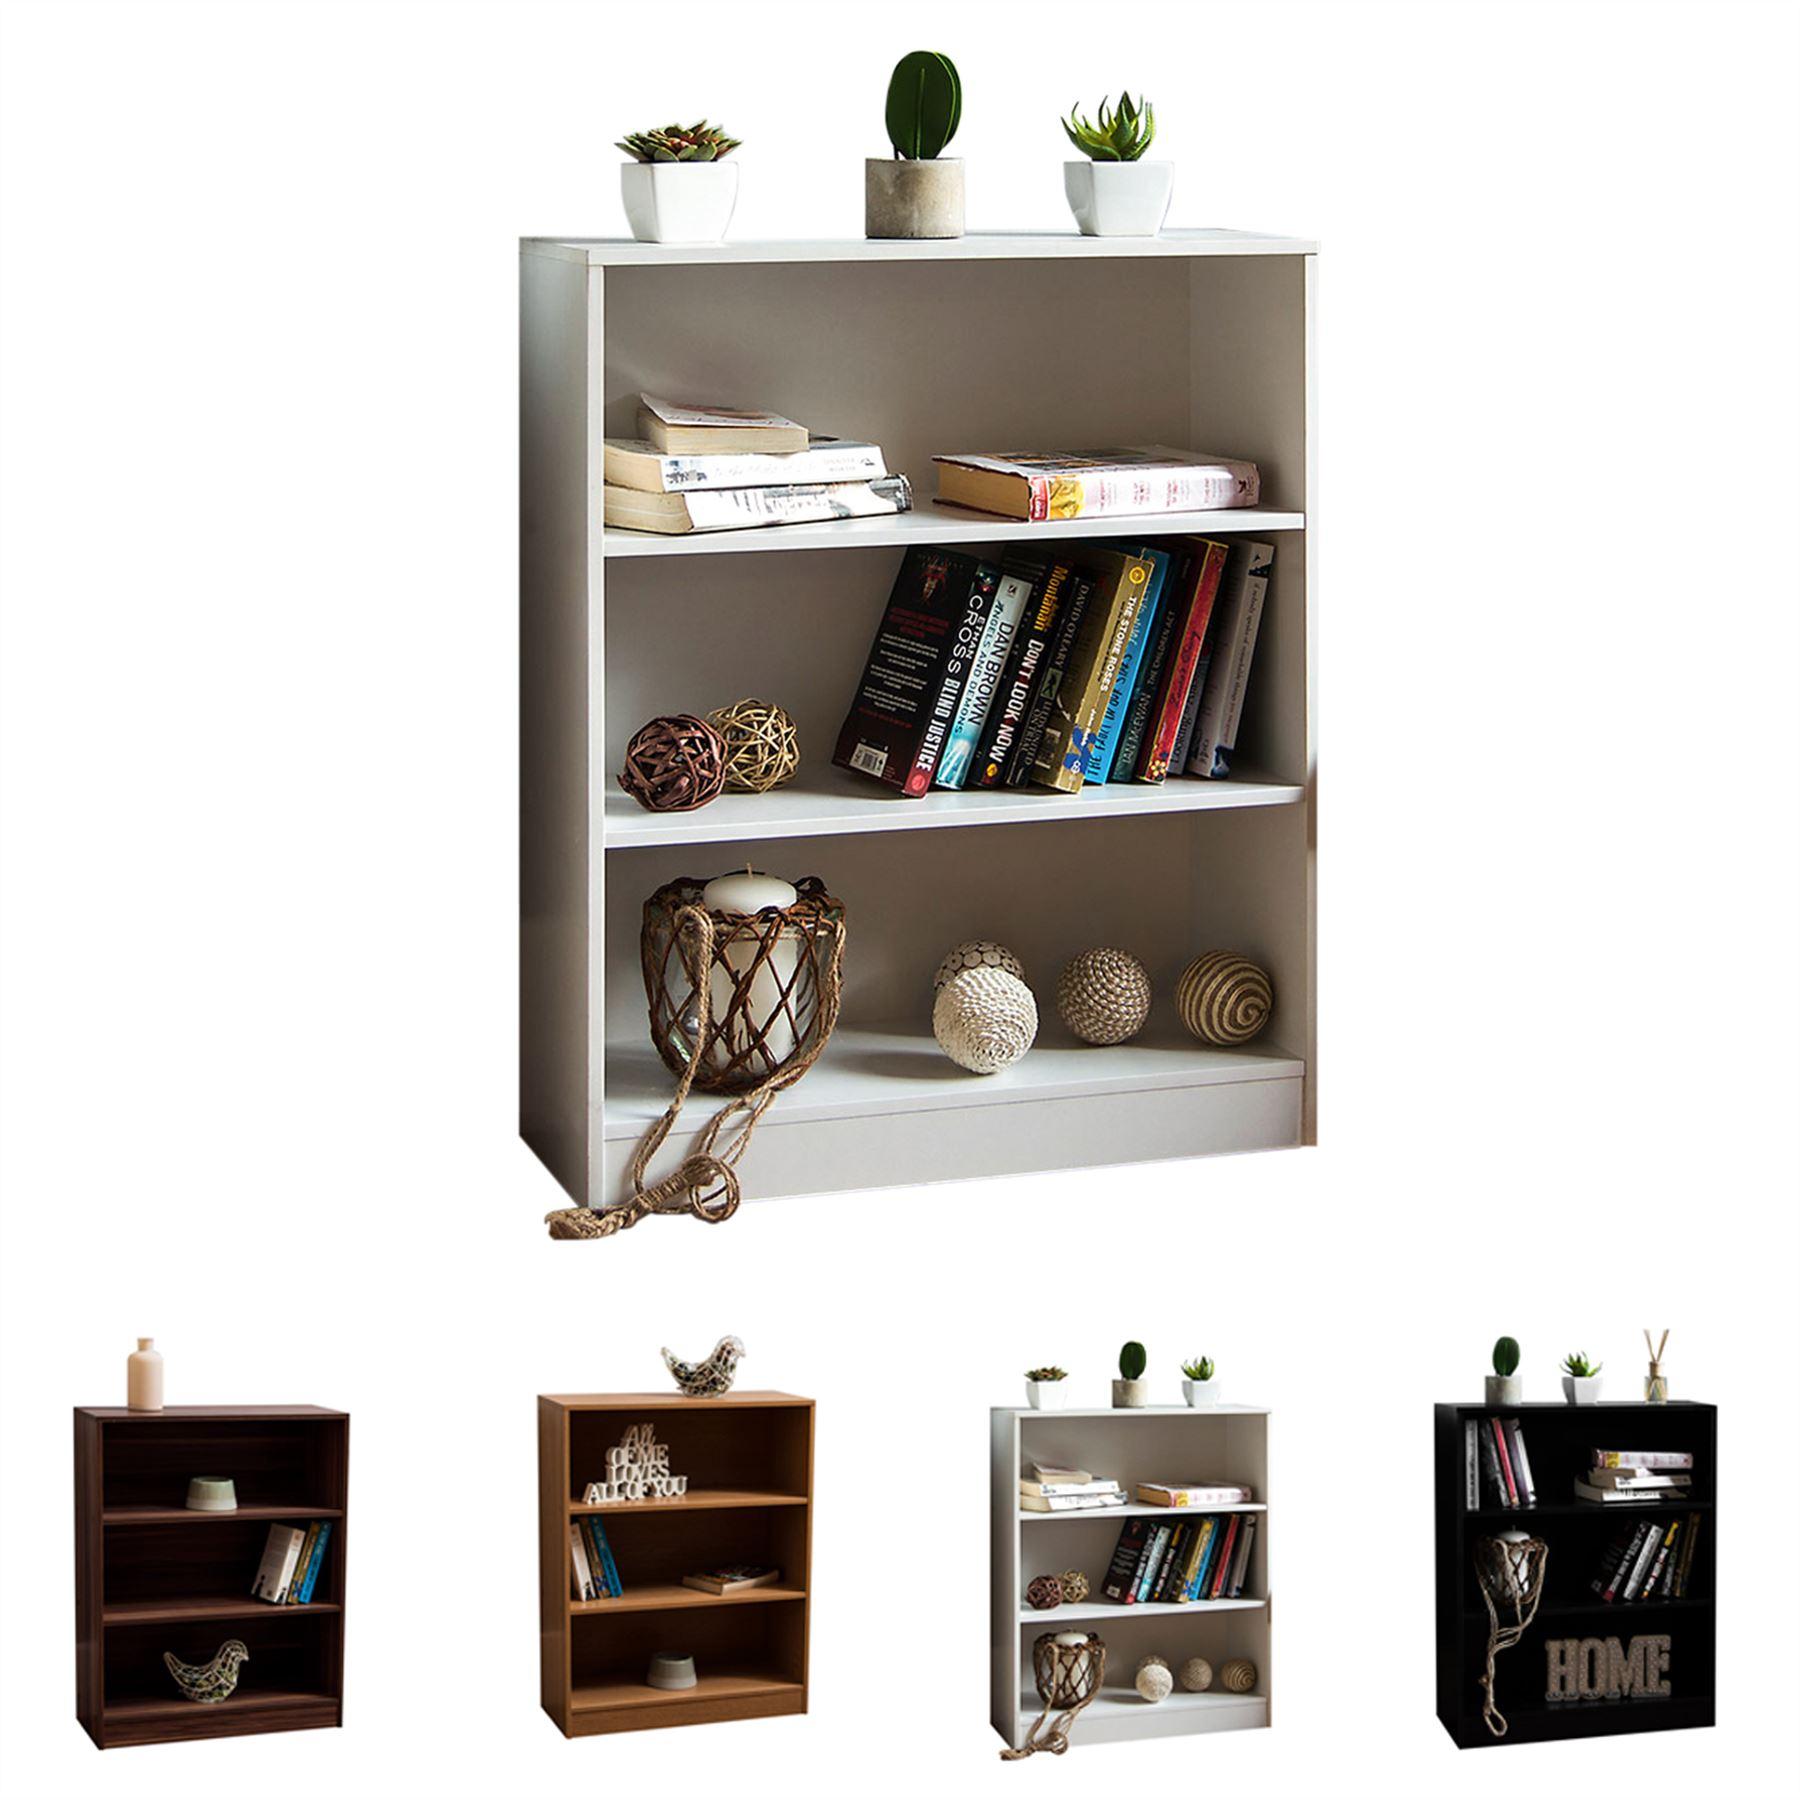 room essentials 5 tier shelving unit instructions